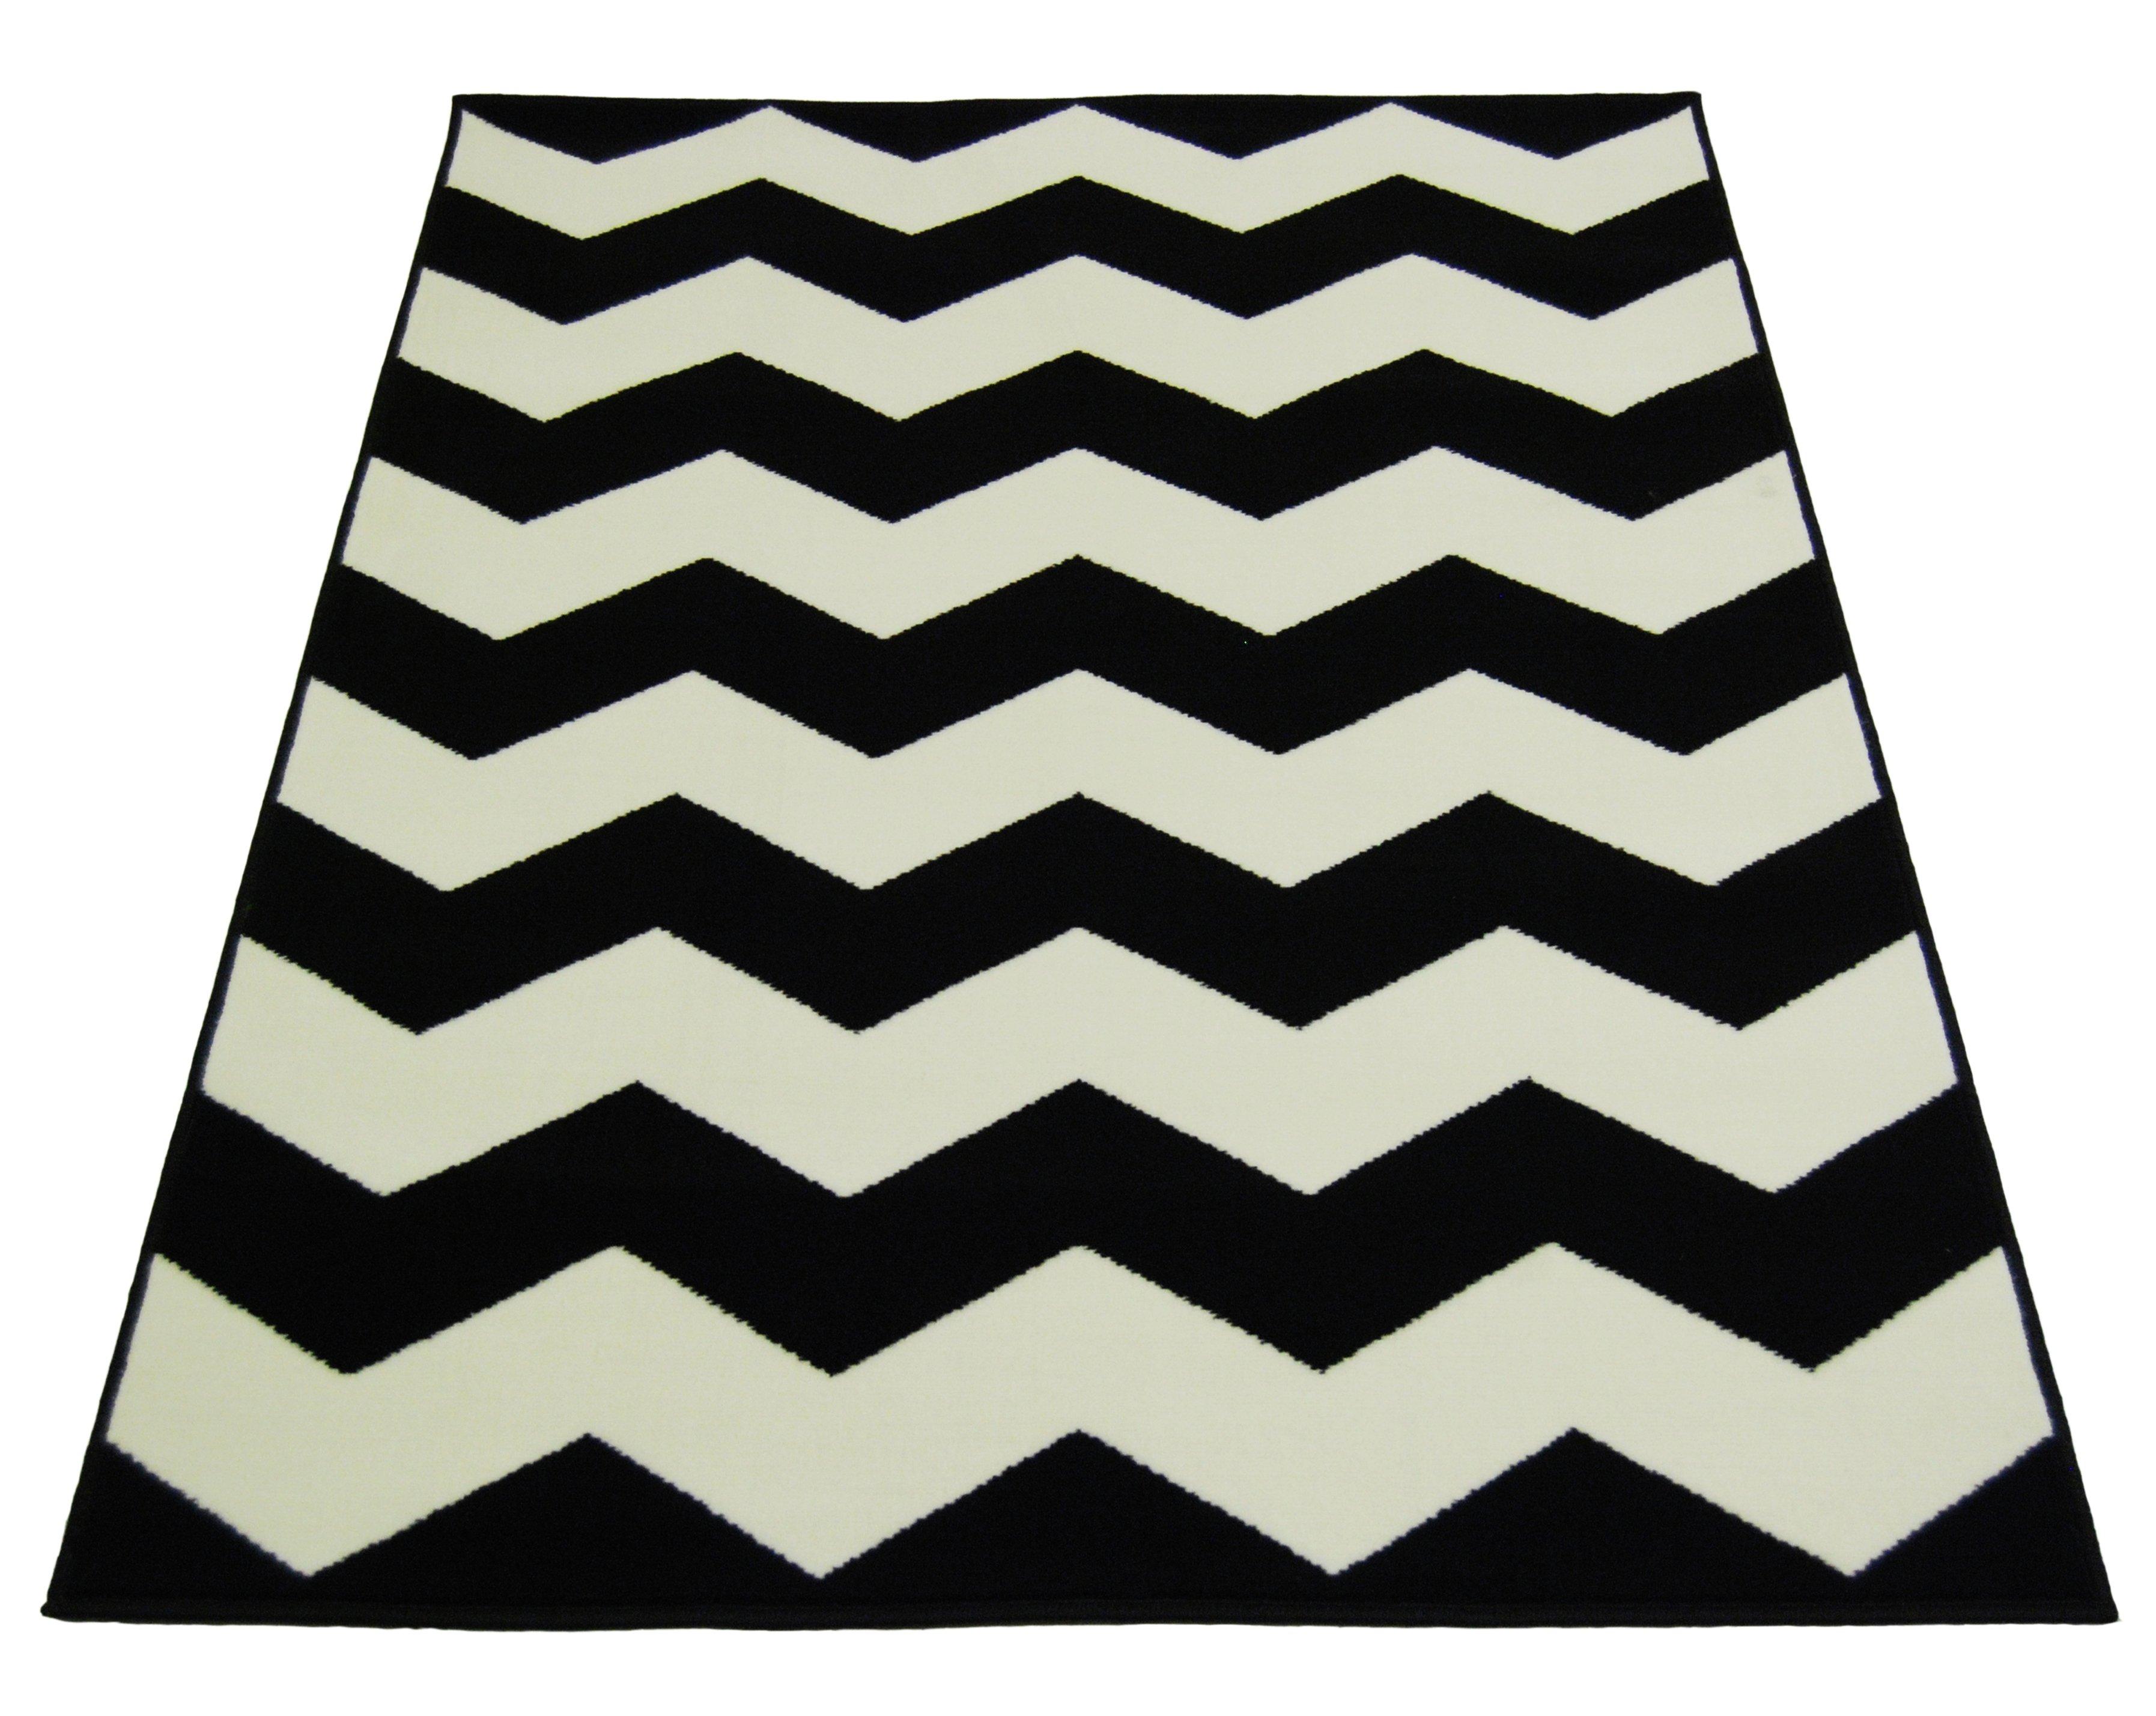 buy chevron rug - 160x230cm - black and white at argos.co.uk